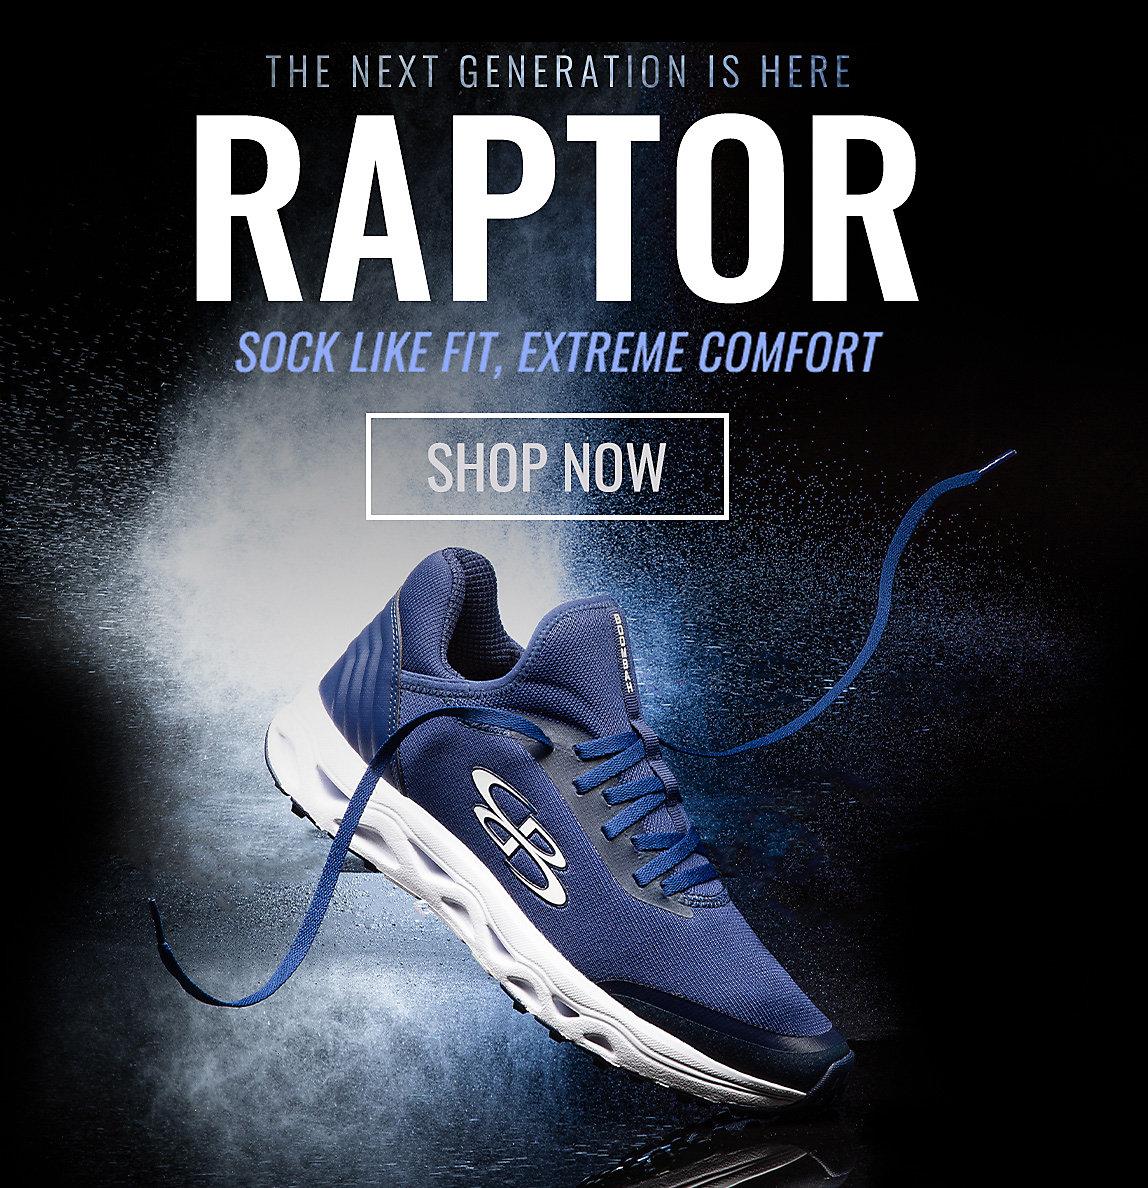 Raptor - Shop Now